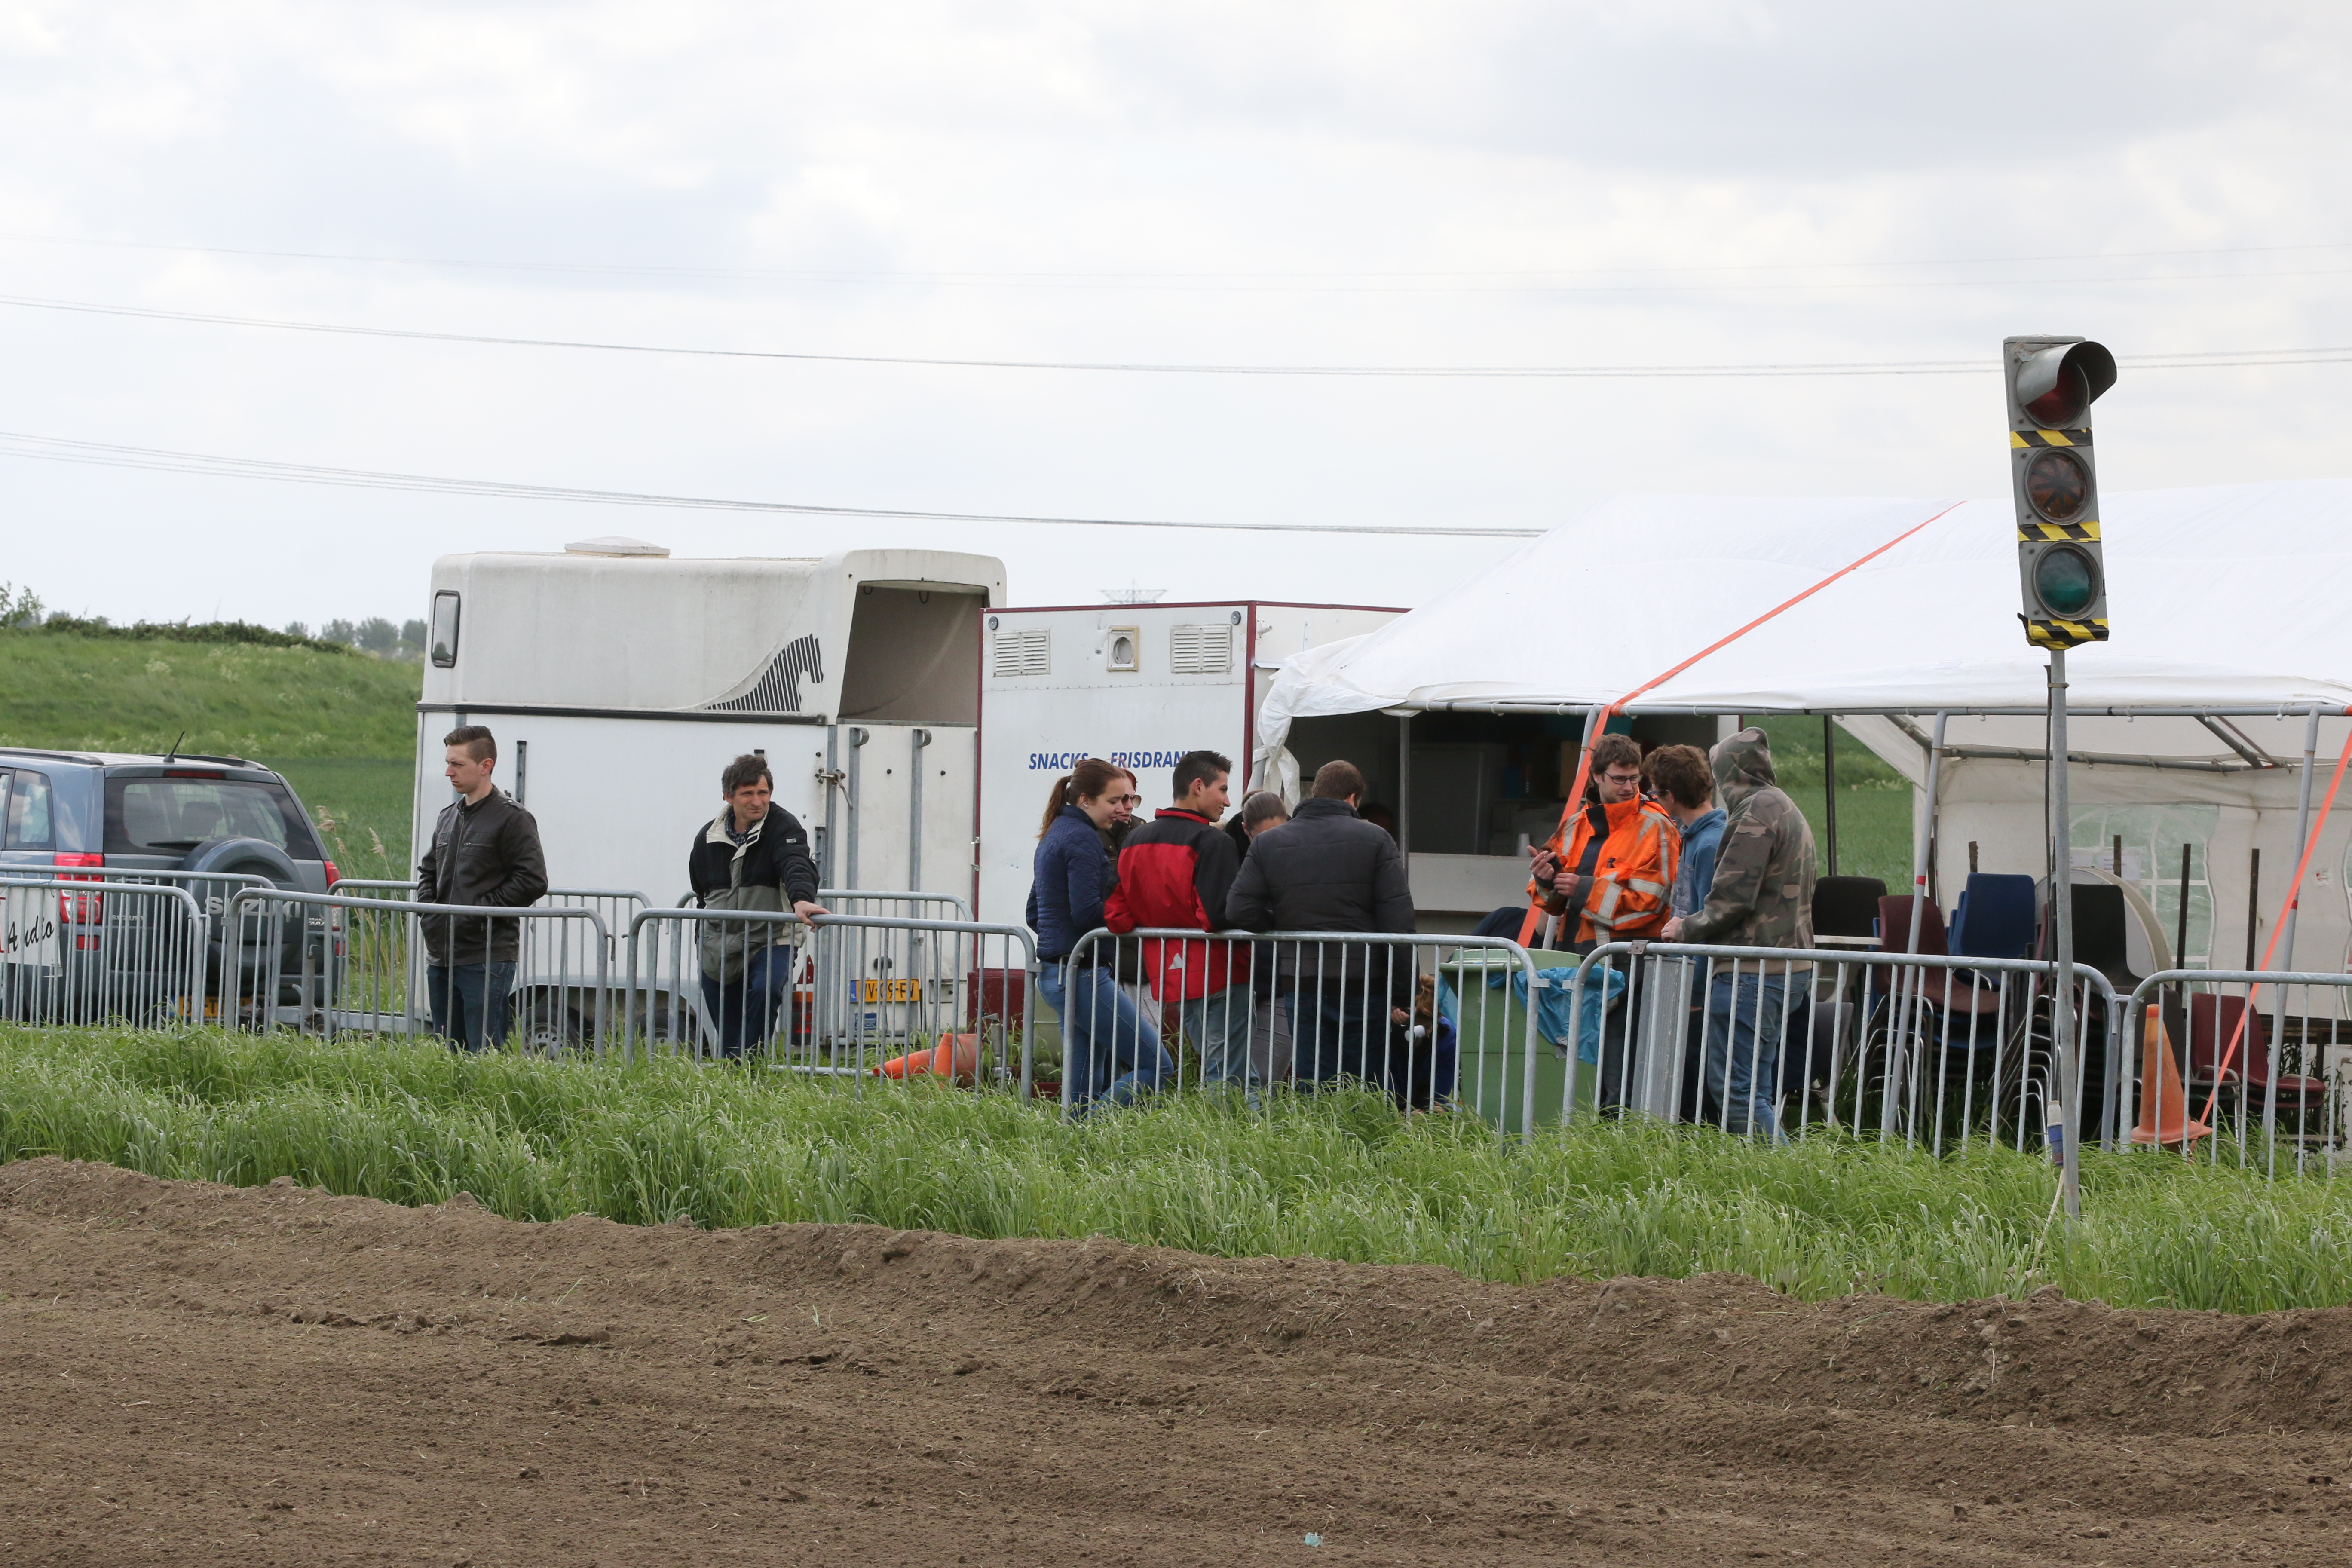 autocross sluiskil 14-5-2016 201